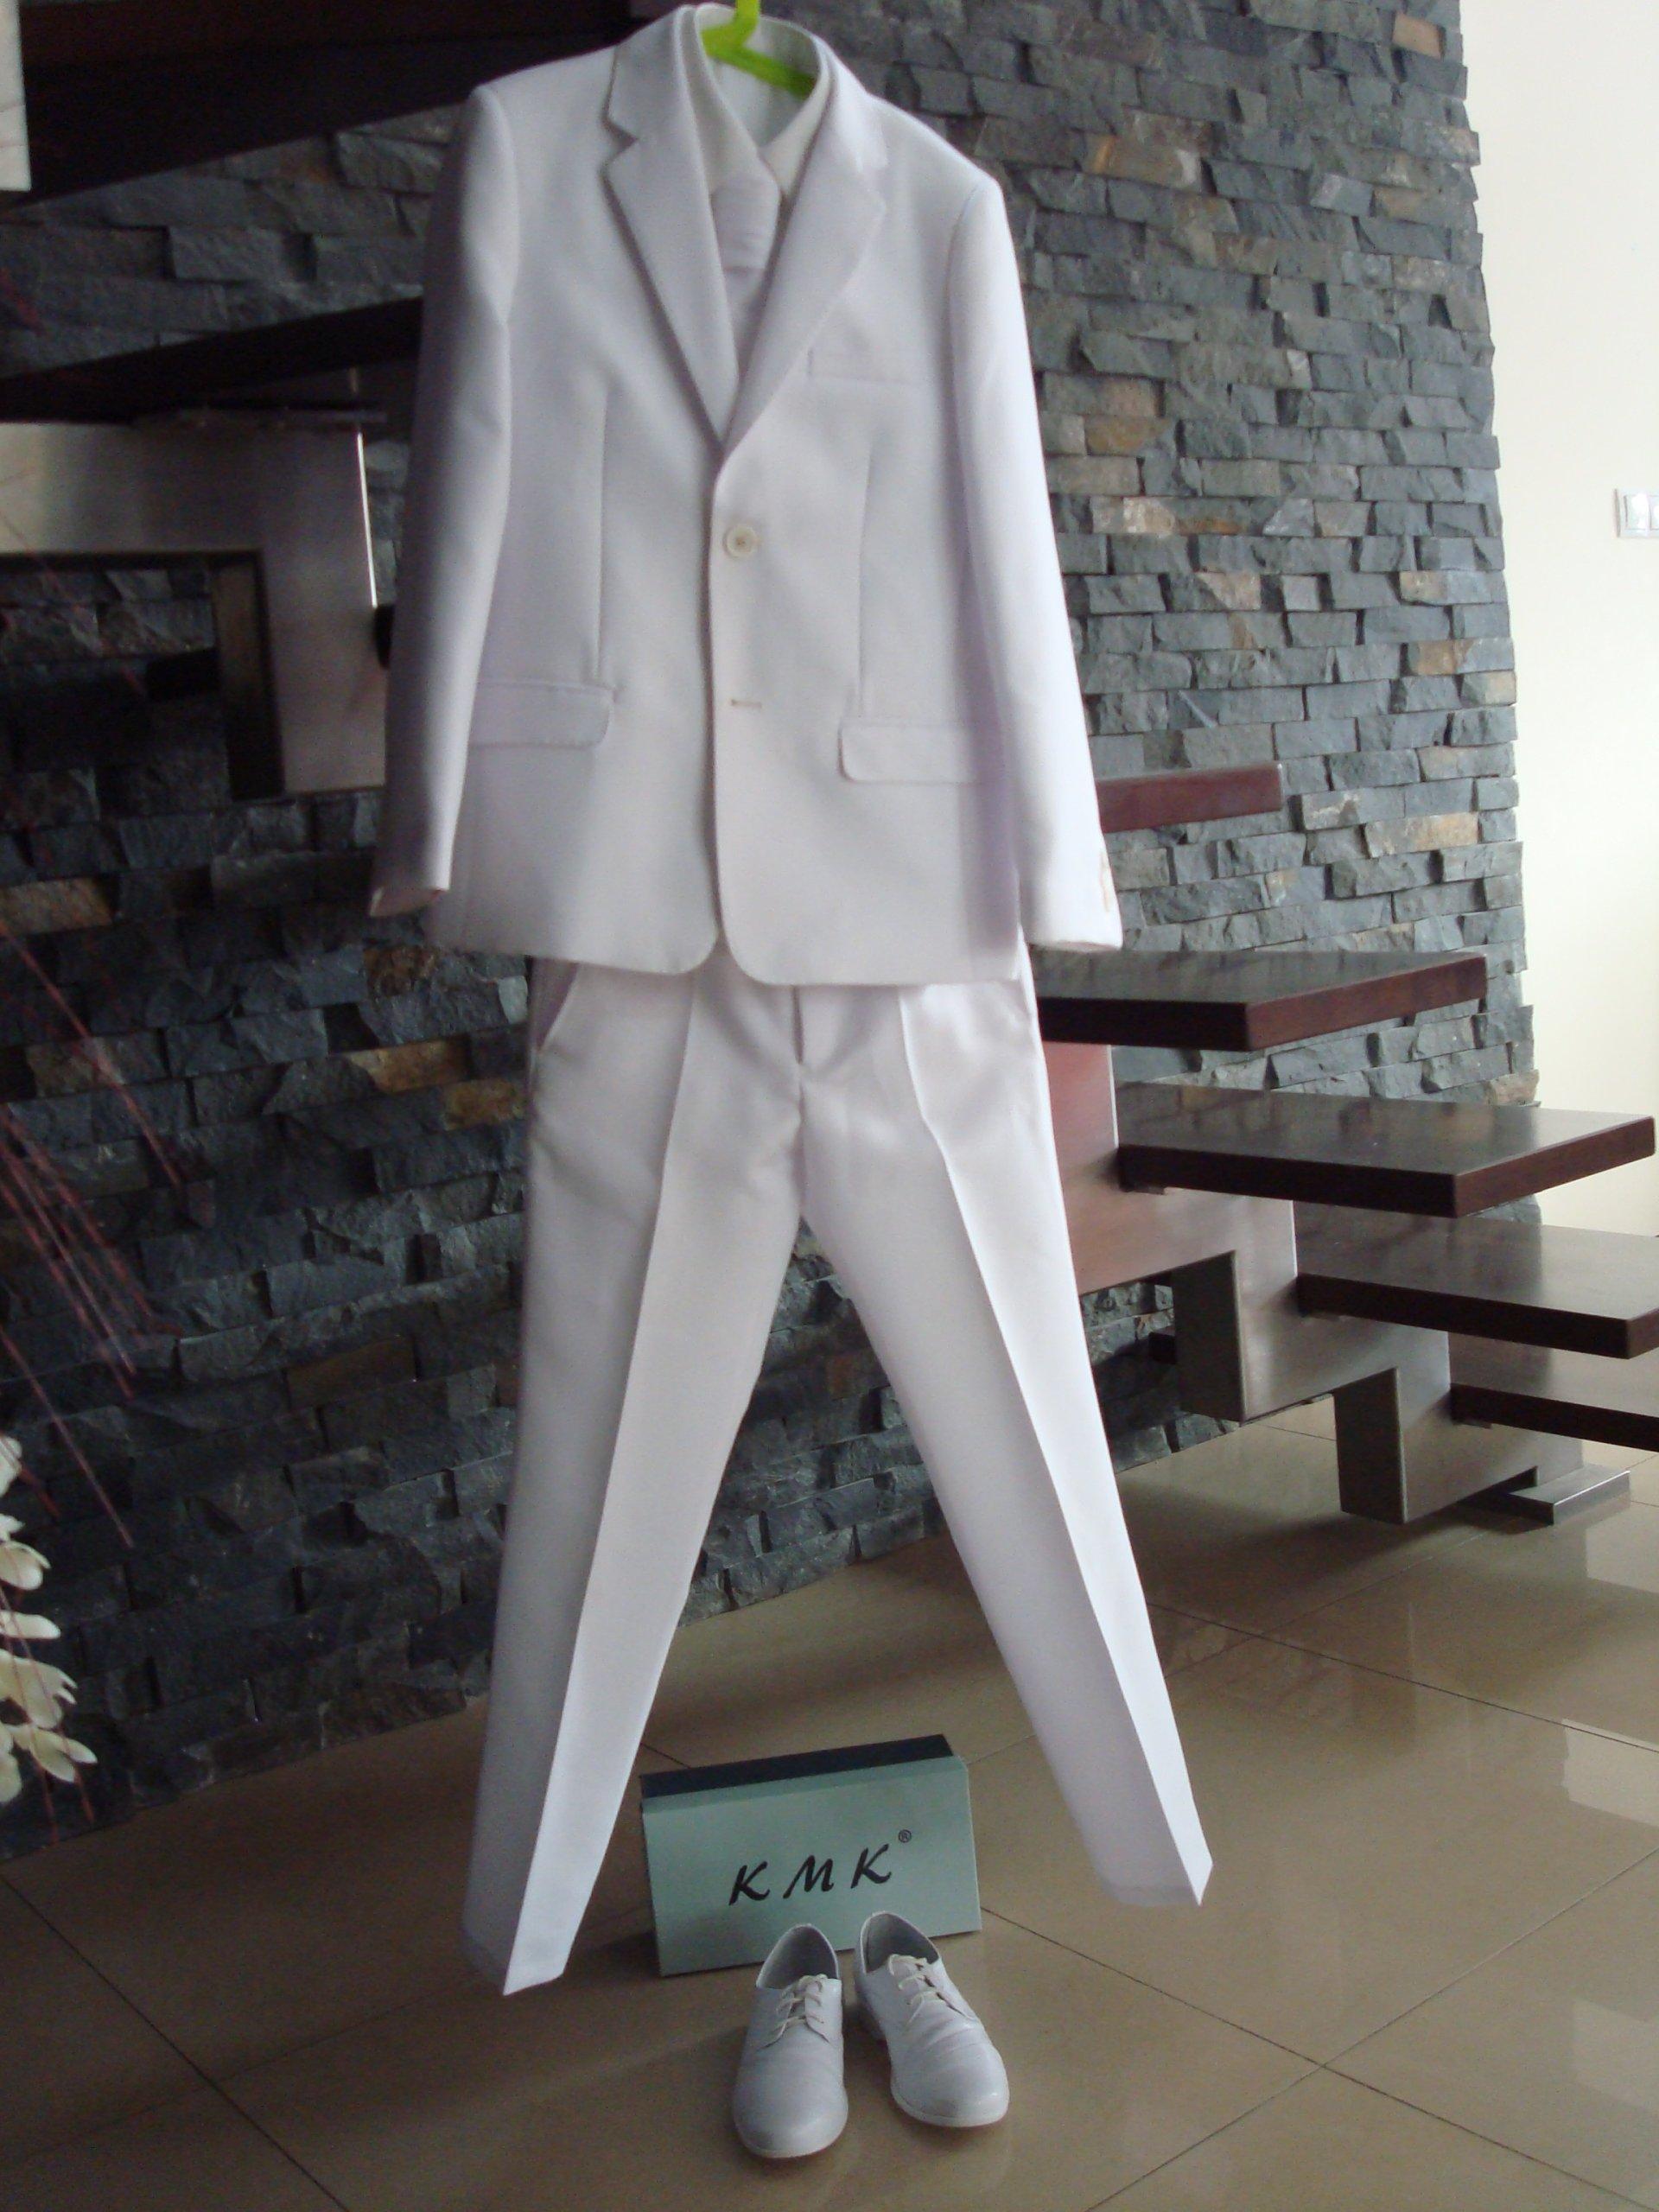 0e9c95855bfa7 Komunia biały garnitur + krawat KONIK 140 + GRATIS - 7204417041 ...